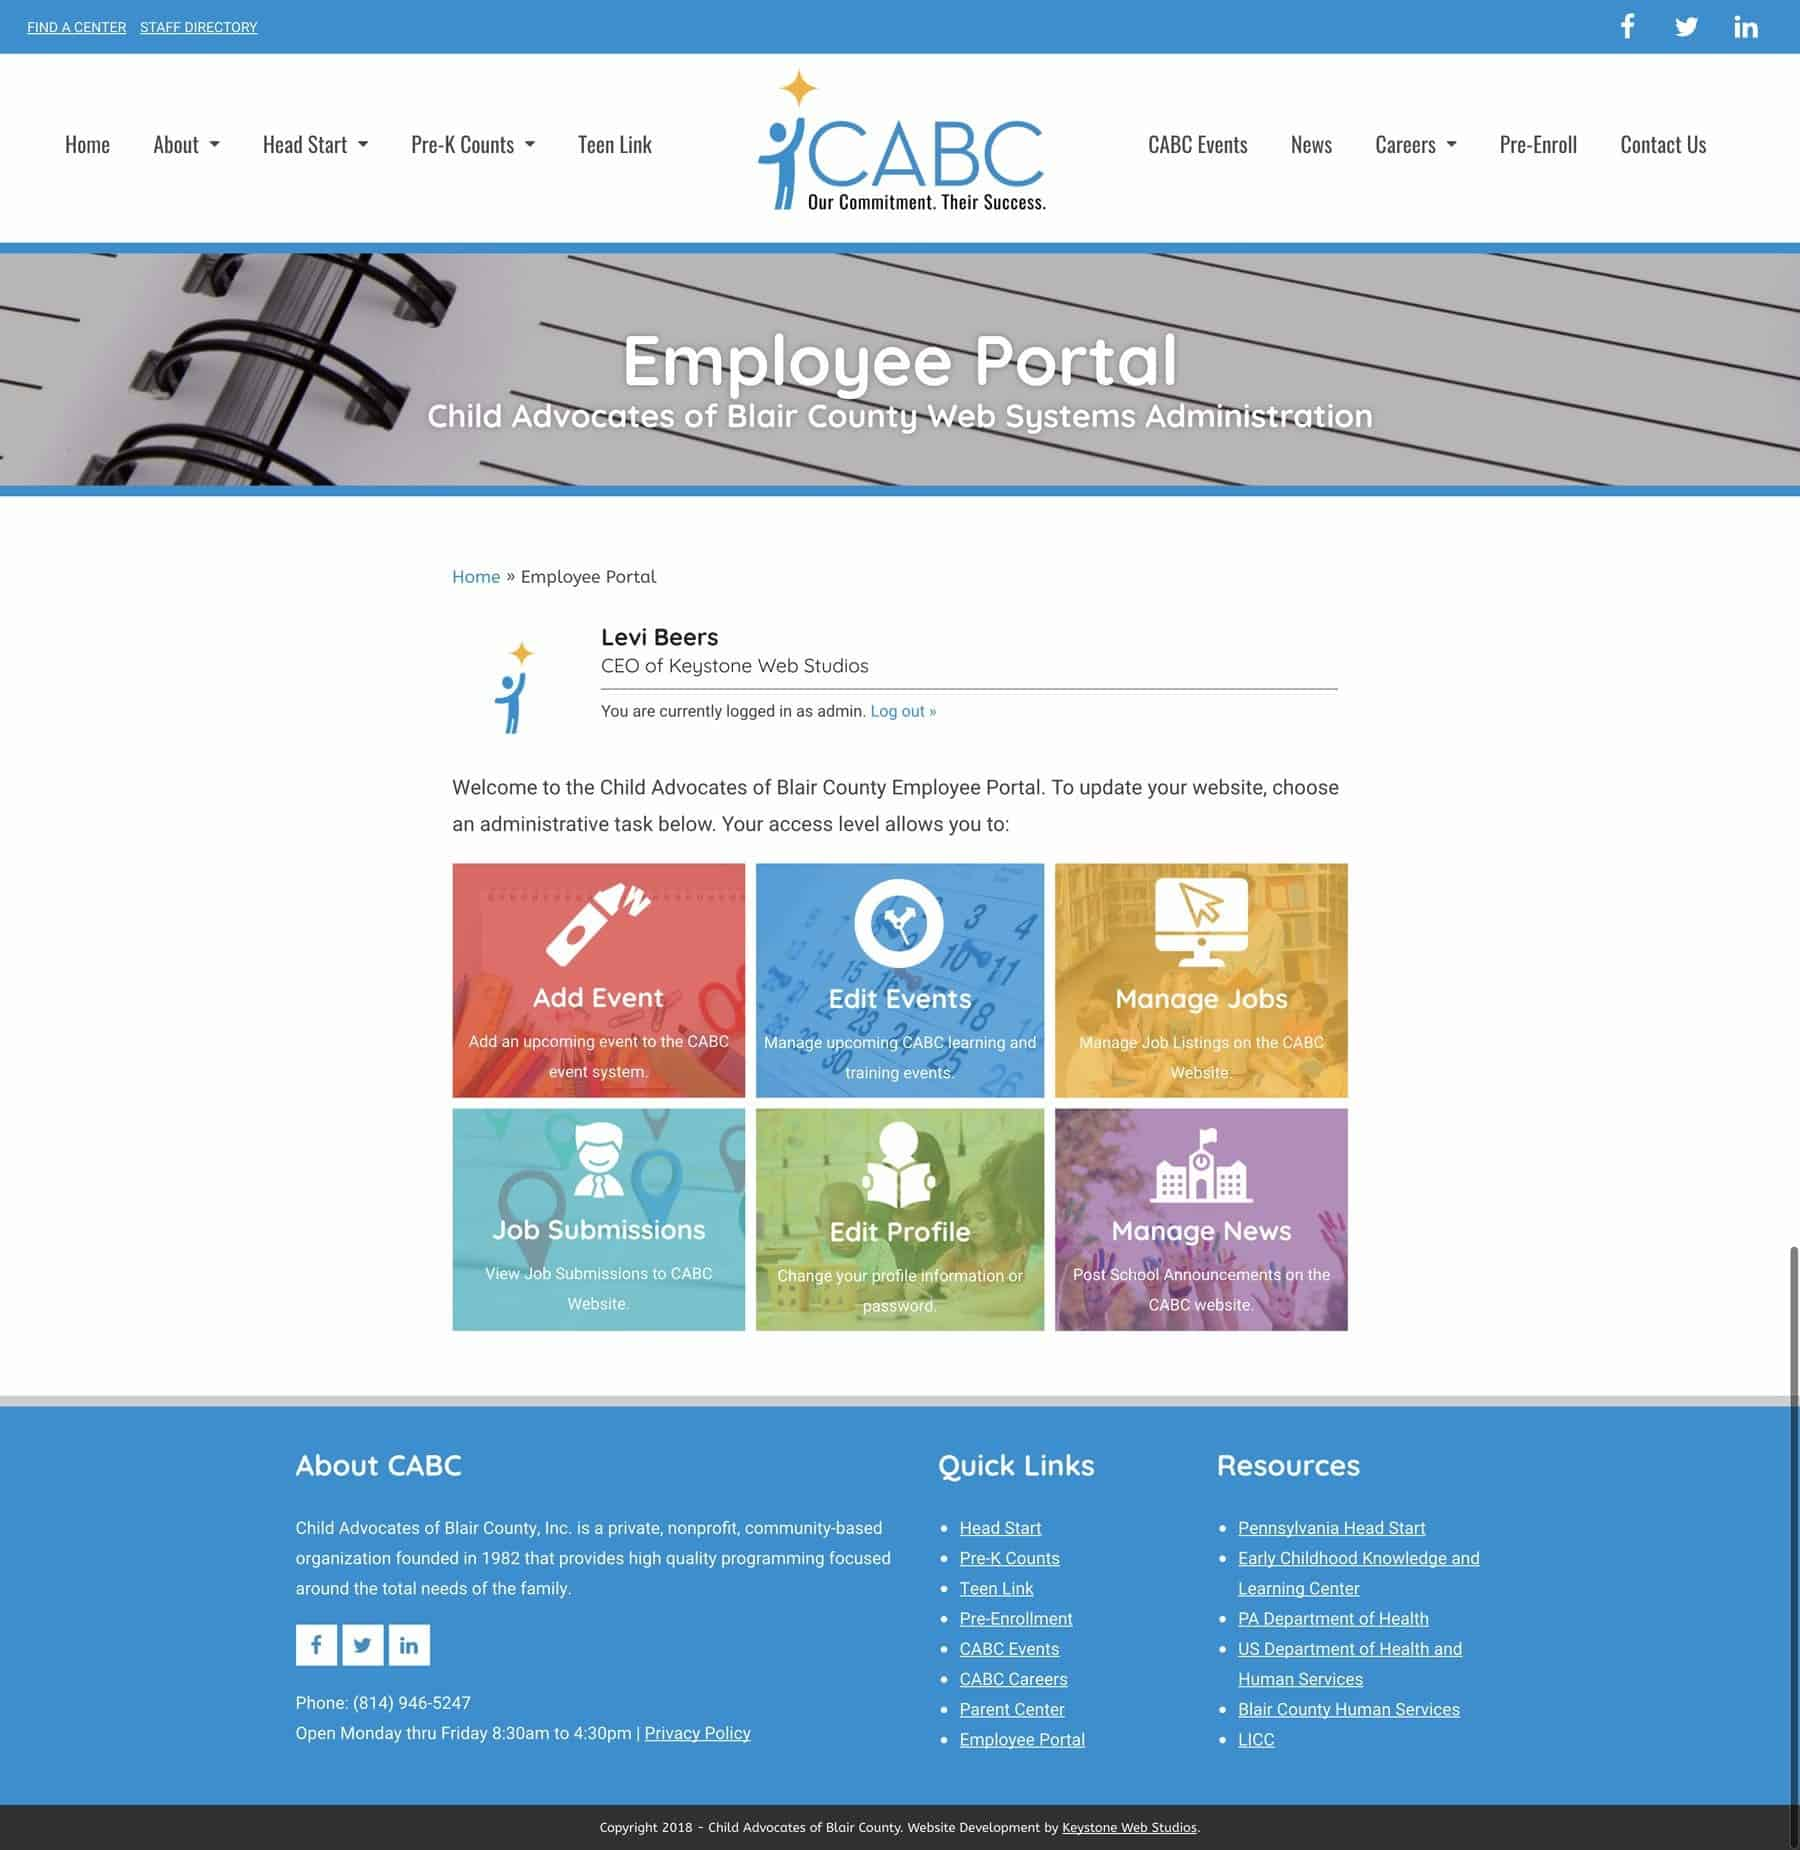 opt-website-management-new